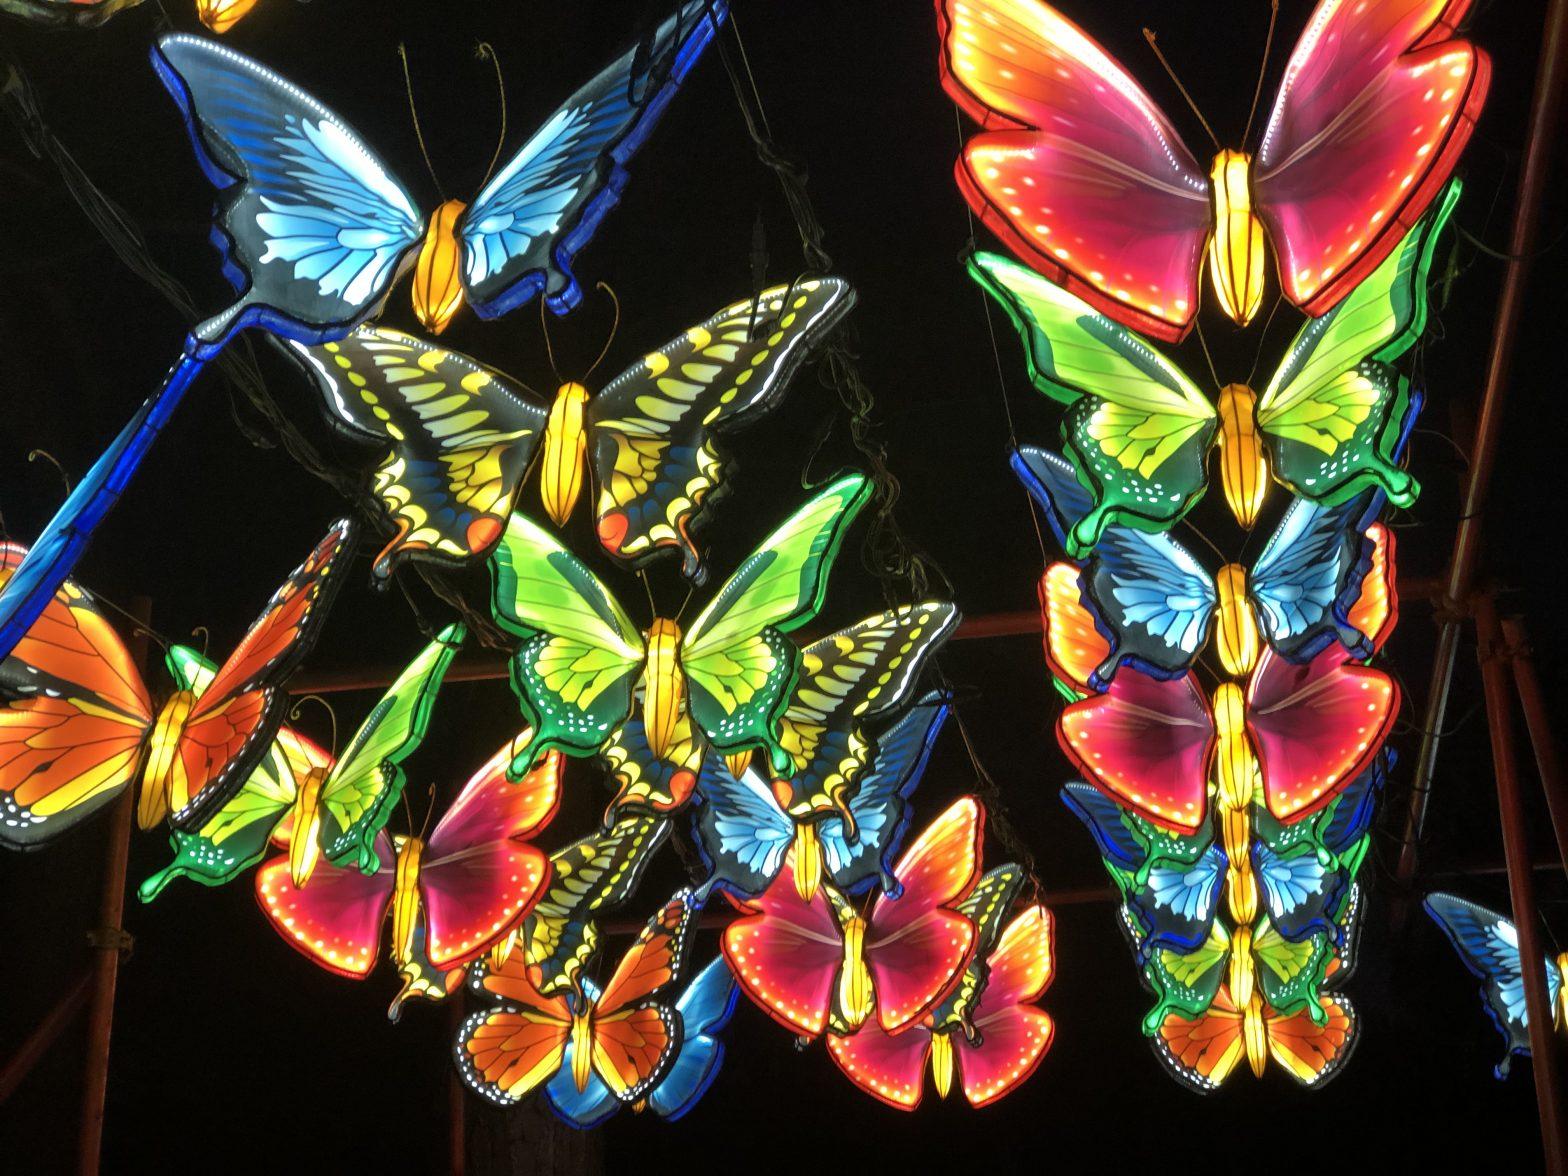 Florida's Asian lantern festival 2021